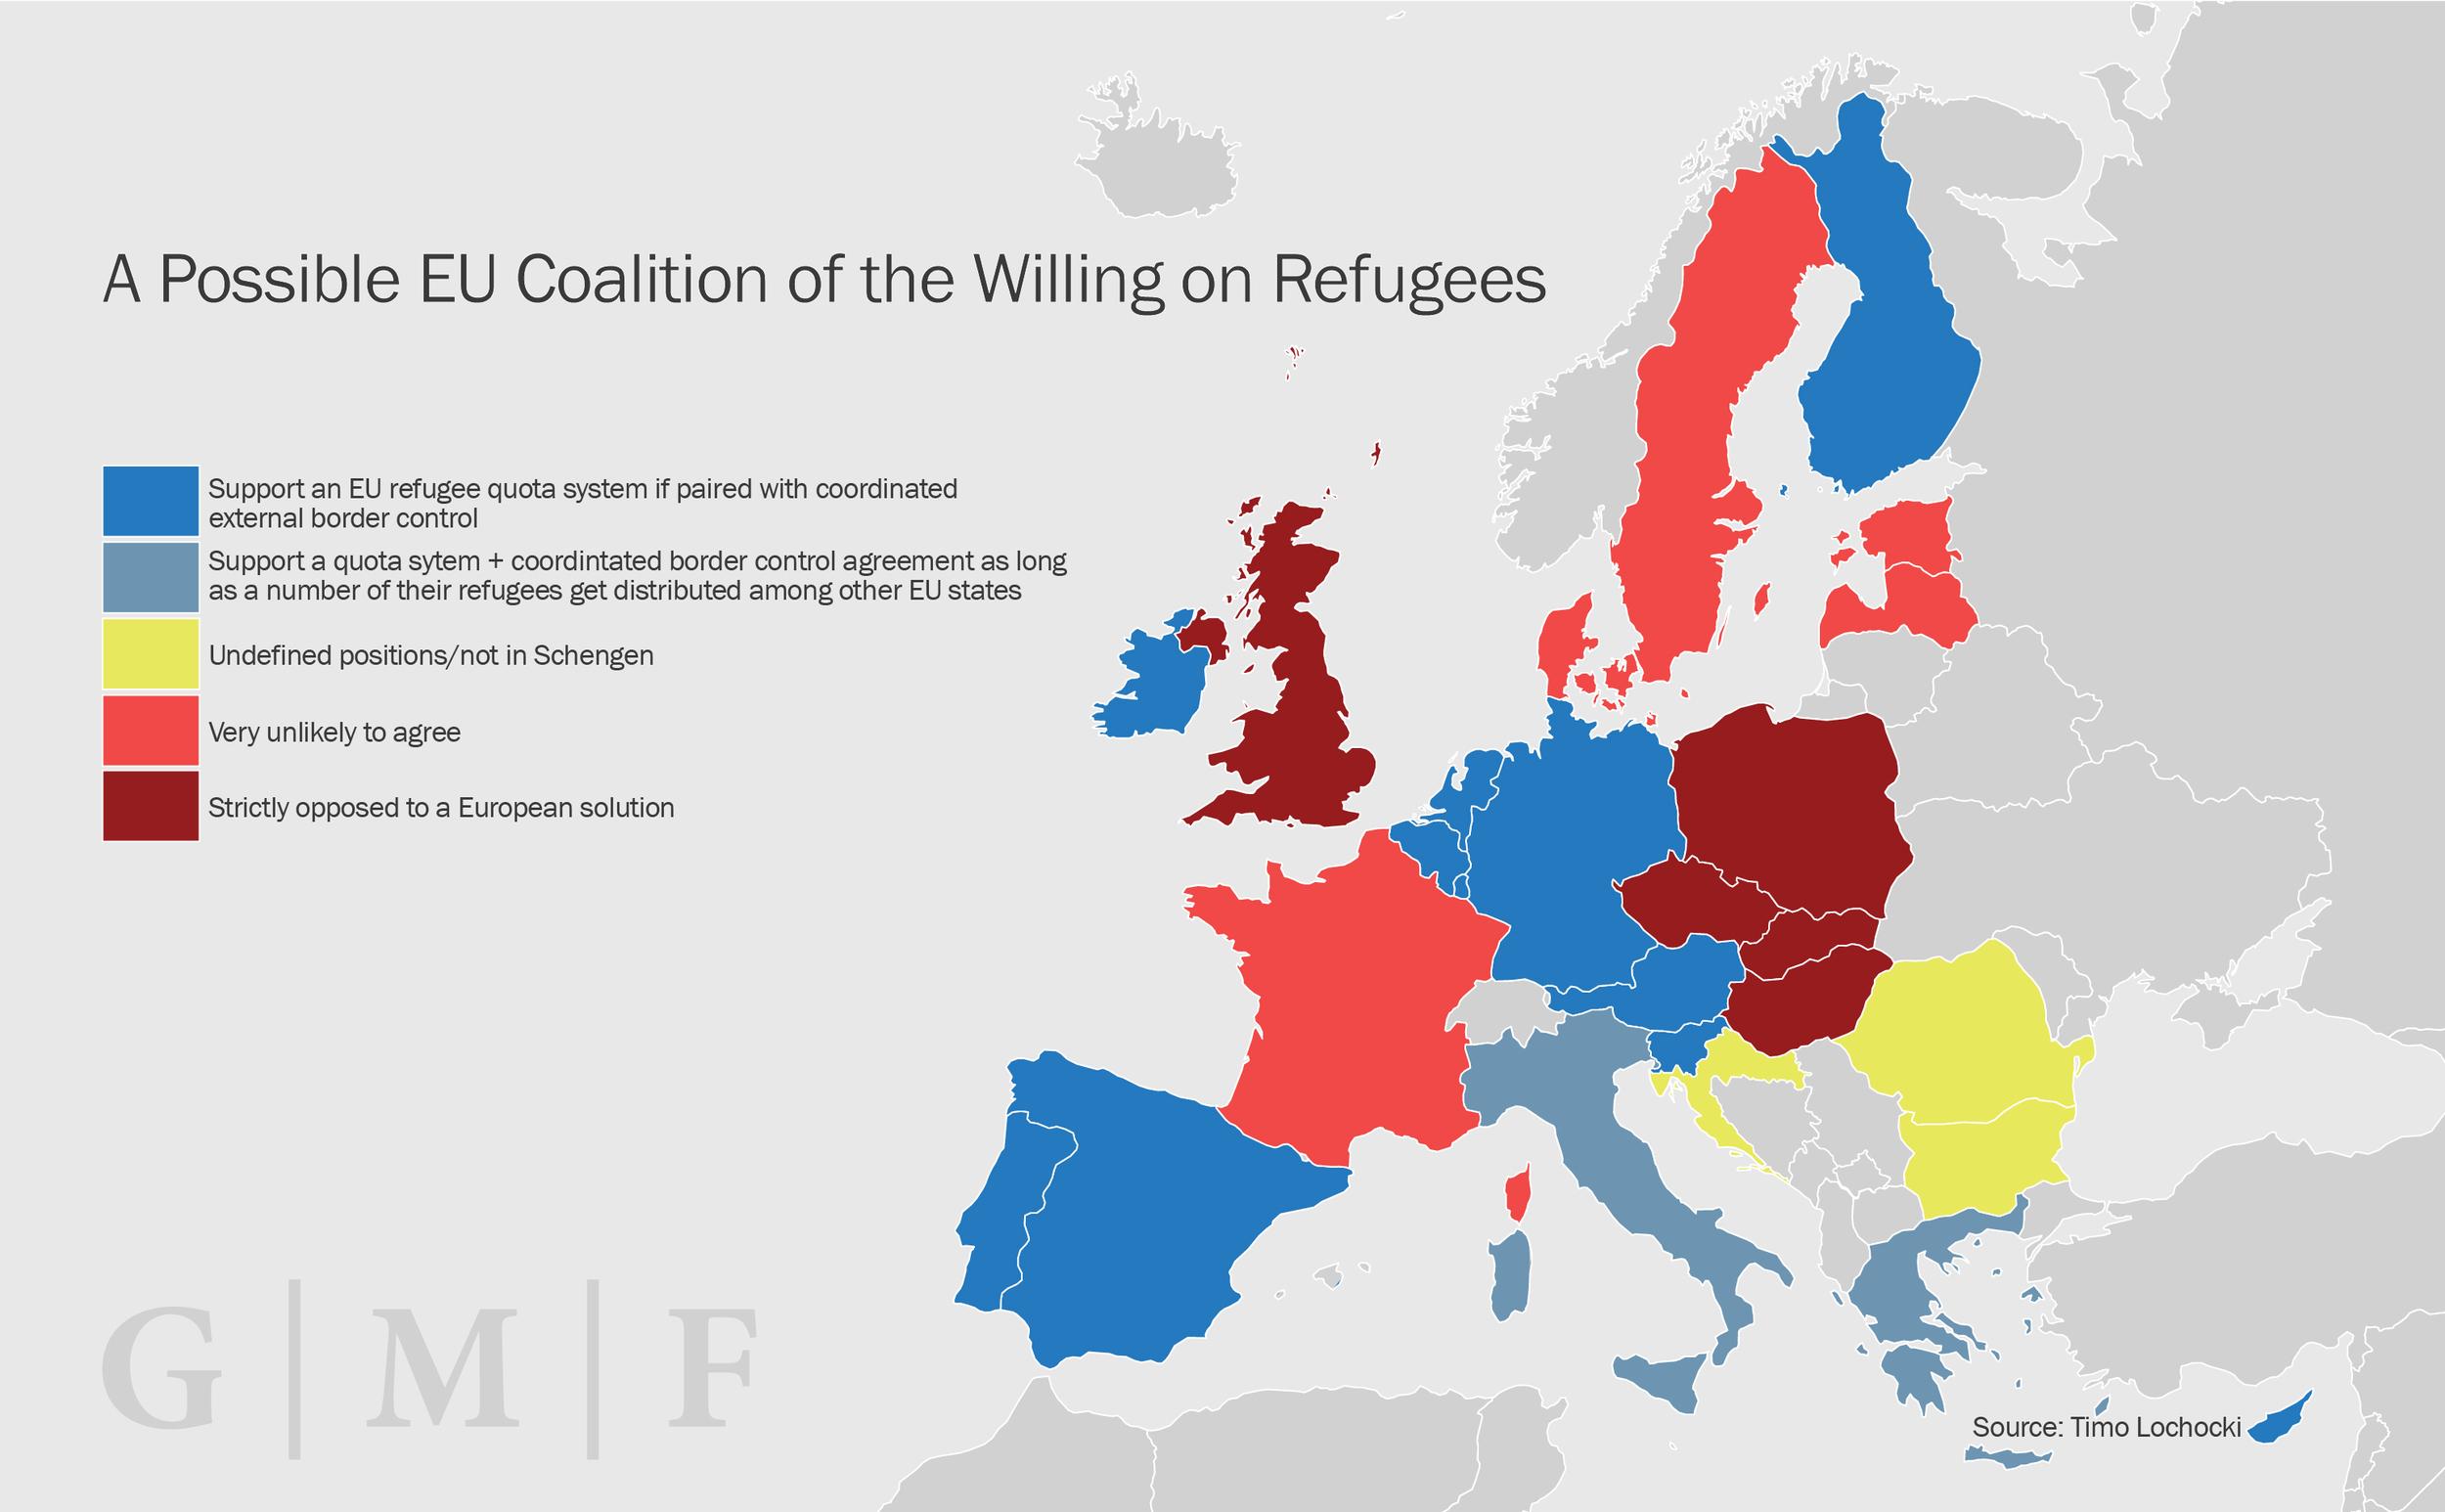 eu refugee coalition.jpg